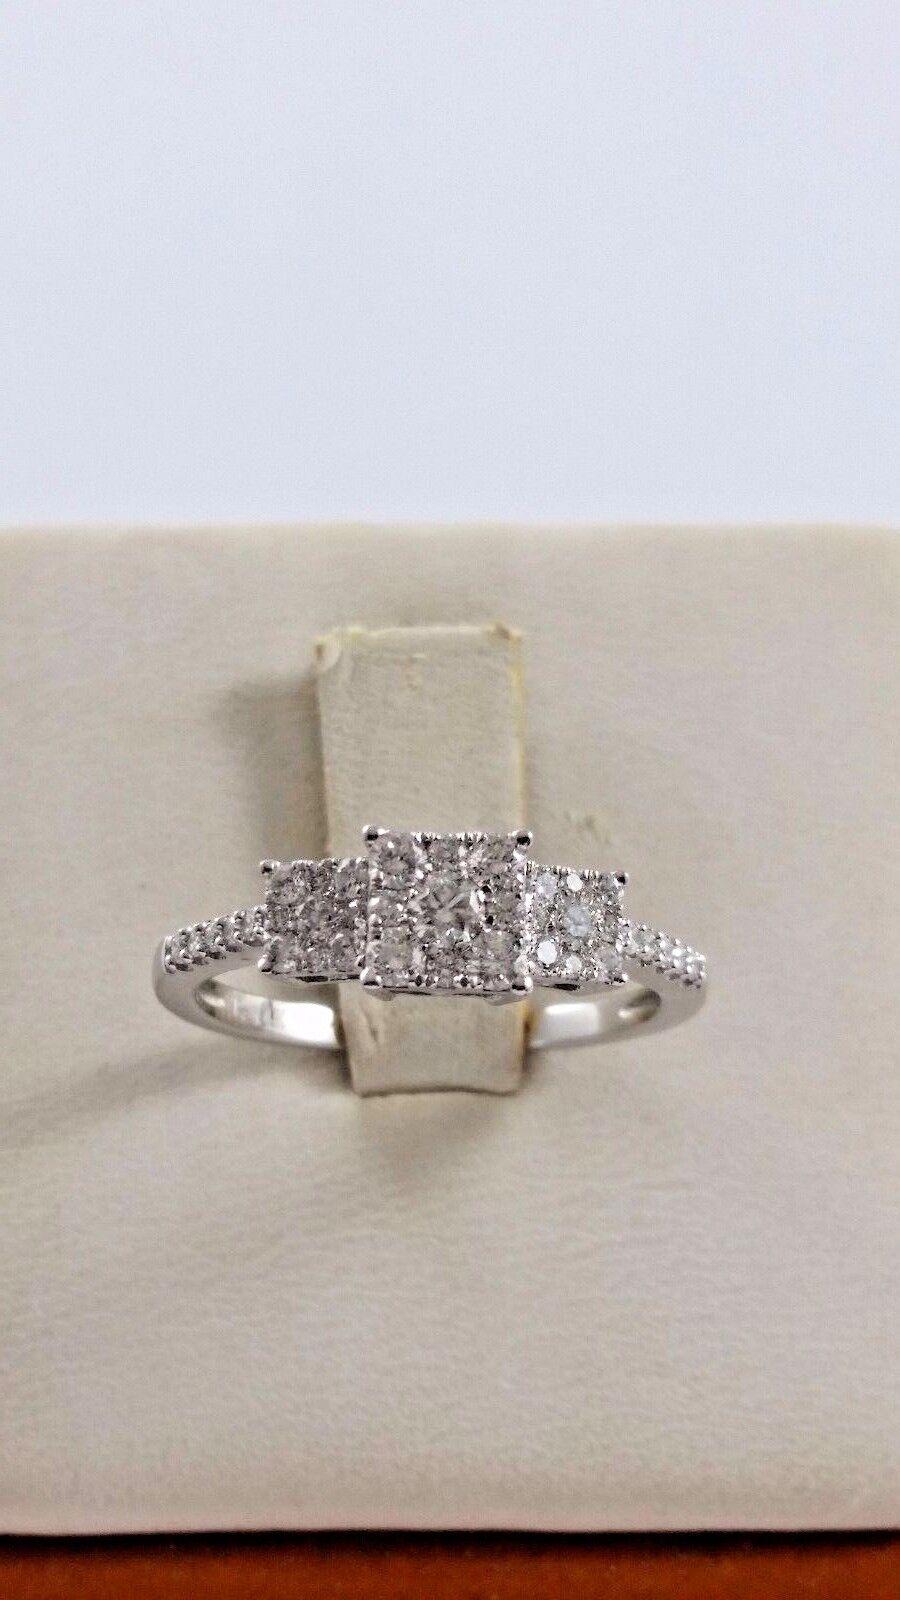 Beautiful 14K Karat White gold Bridal Engagement Ring with Diamonds